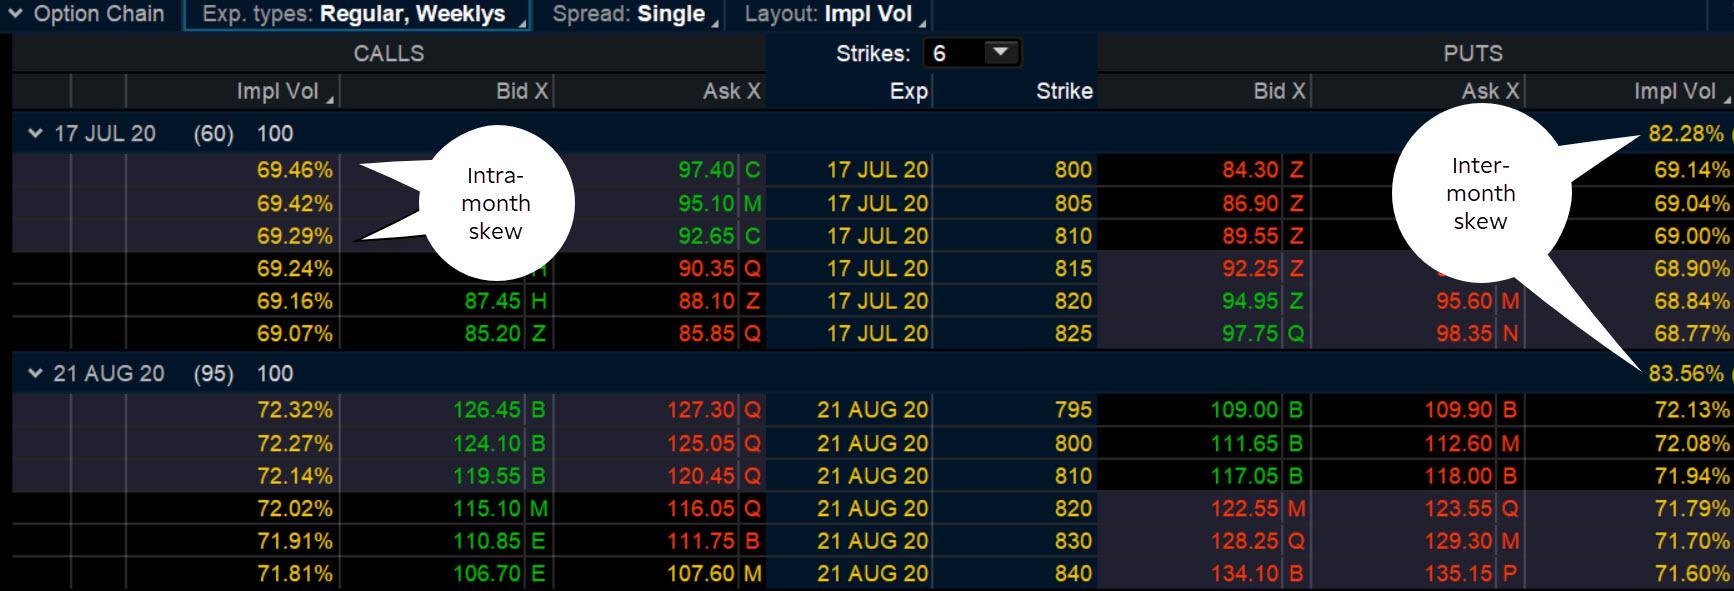 Implied volatility options